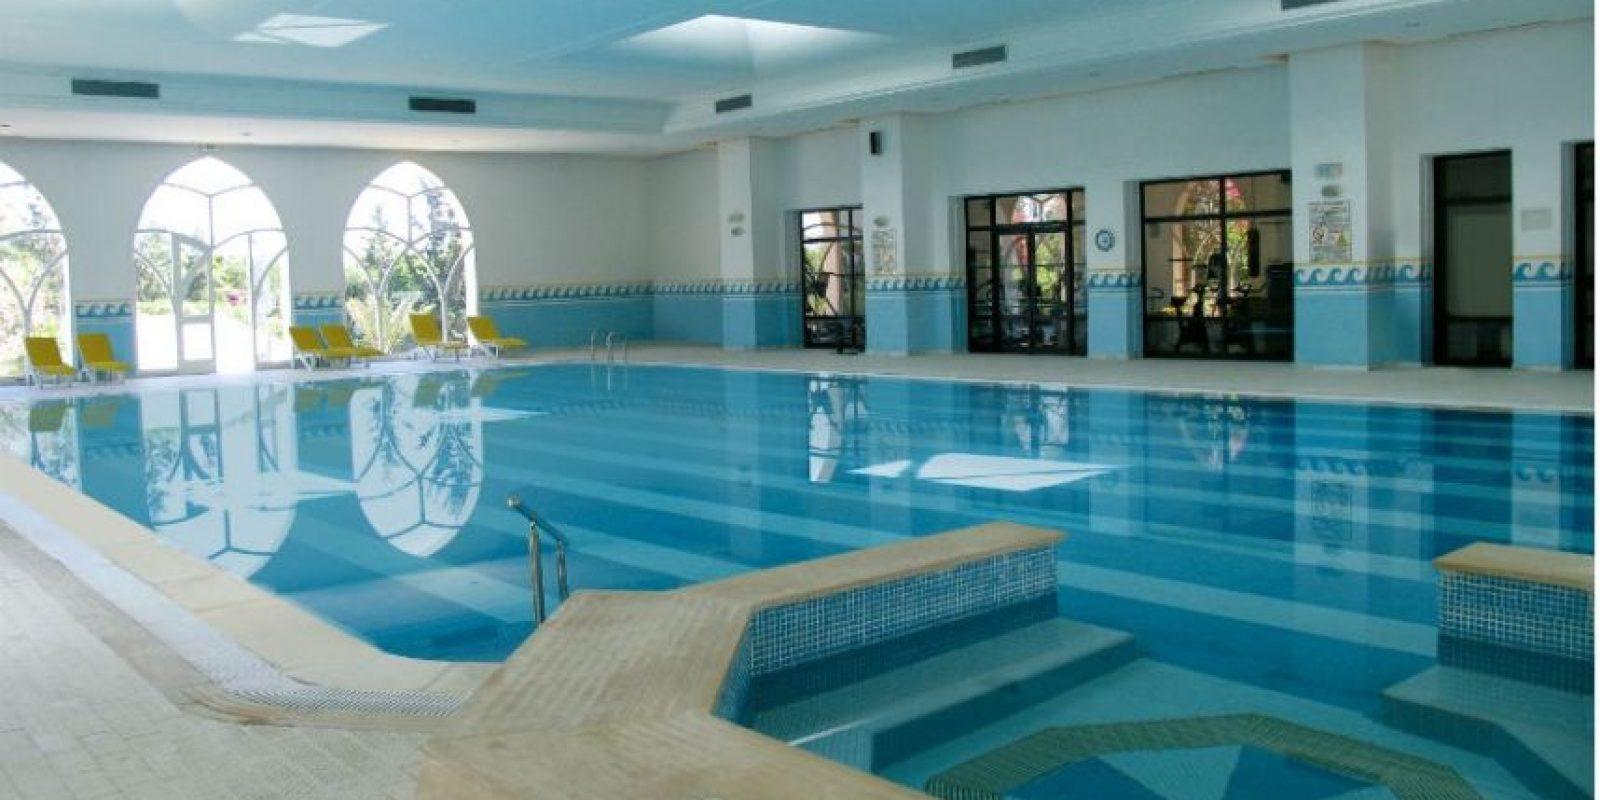 Tiene una piscina de agua dulce de 400 m² Foto:Riu.com